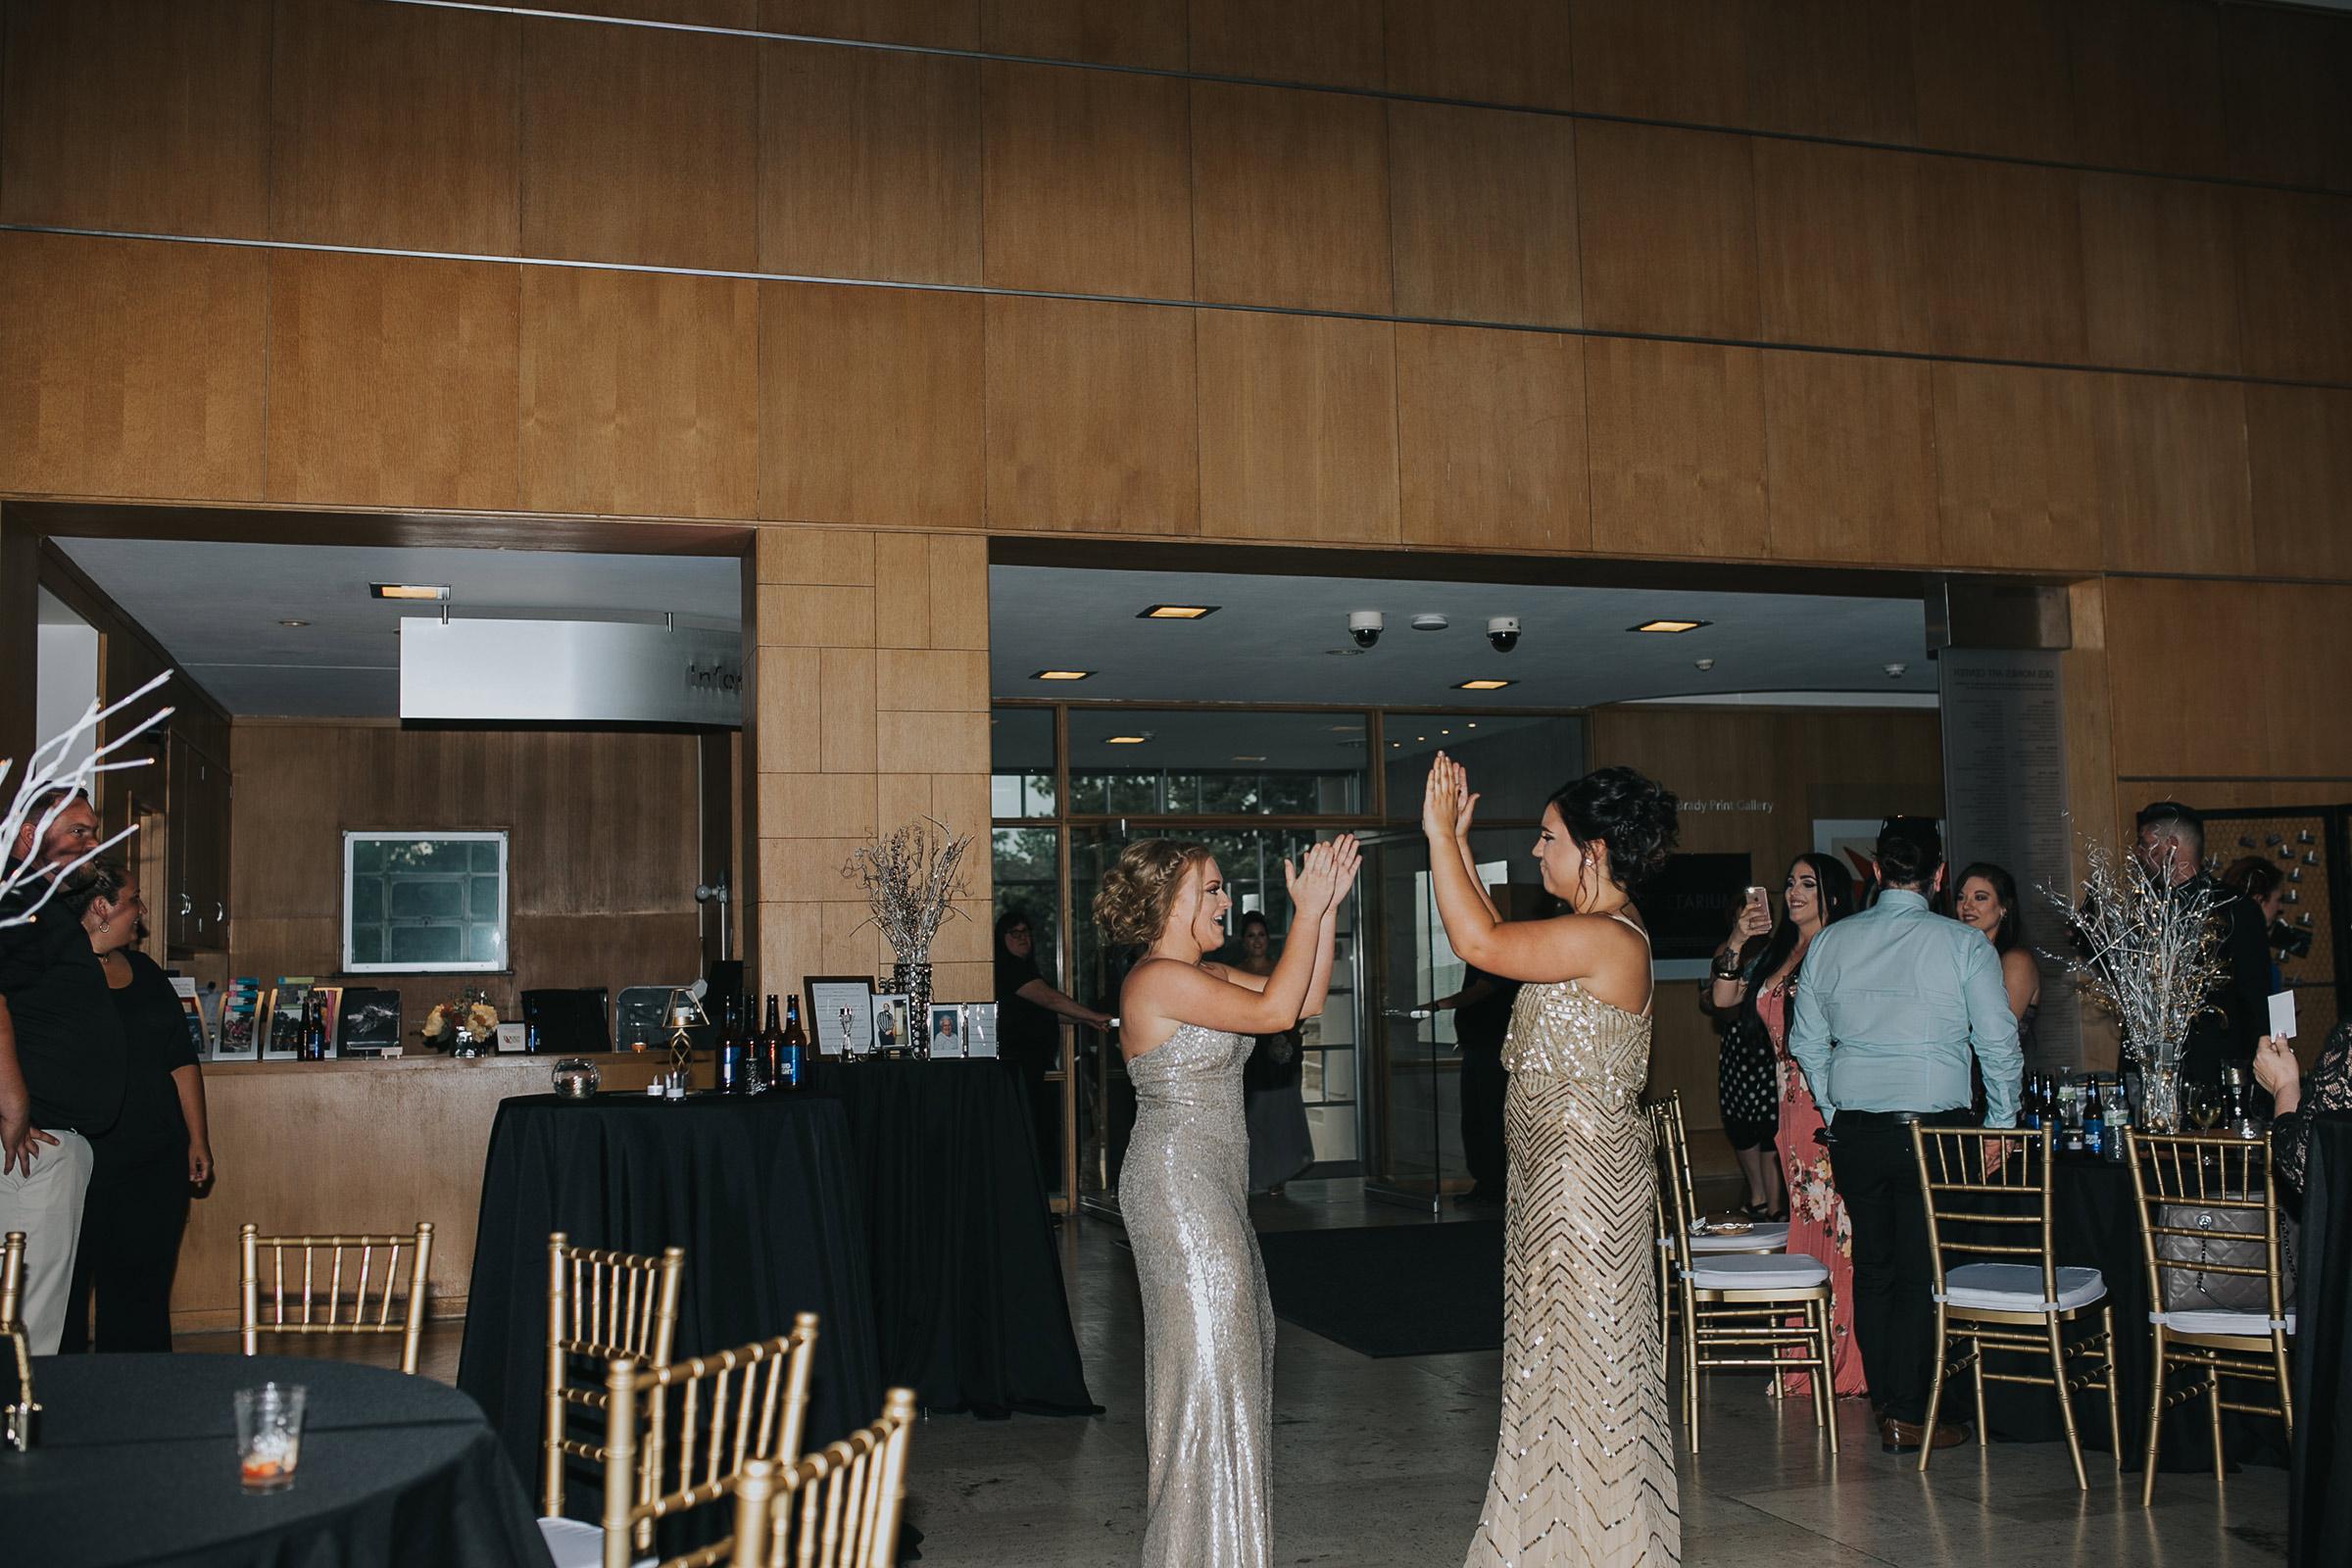 bridesmaids-grand-enterance-handshake-desmoines-iowa-art-center-raelyn-ramey-photography.jpg